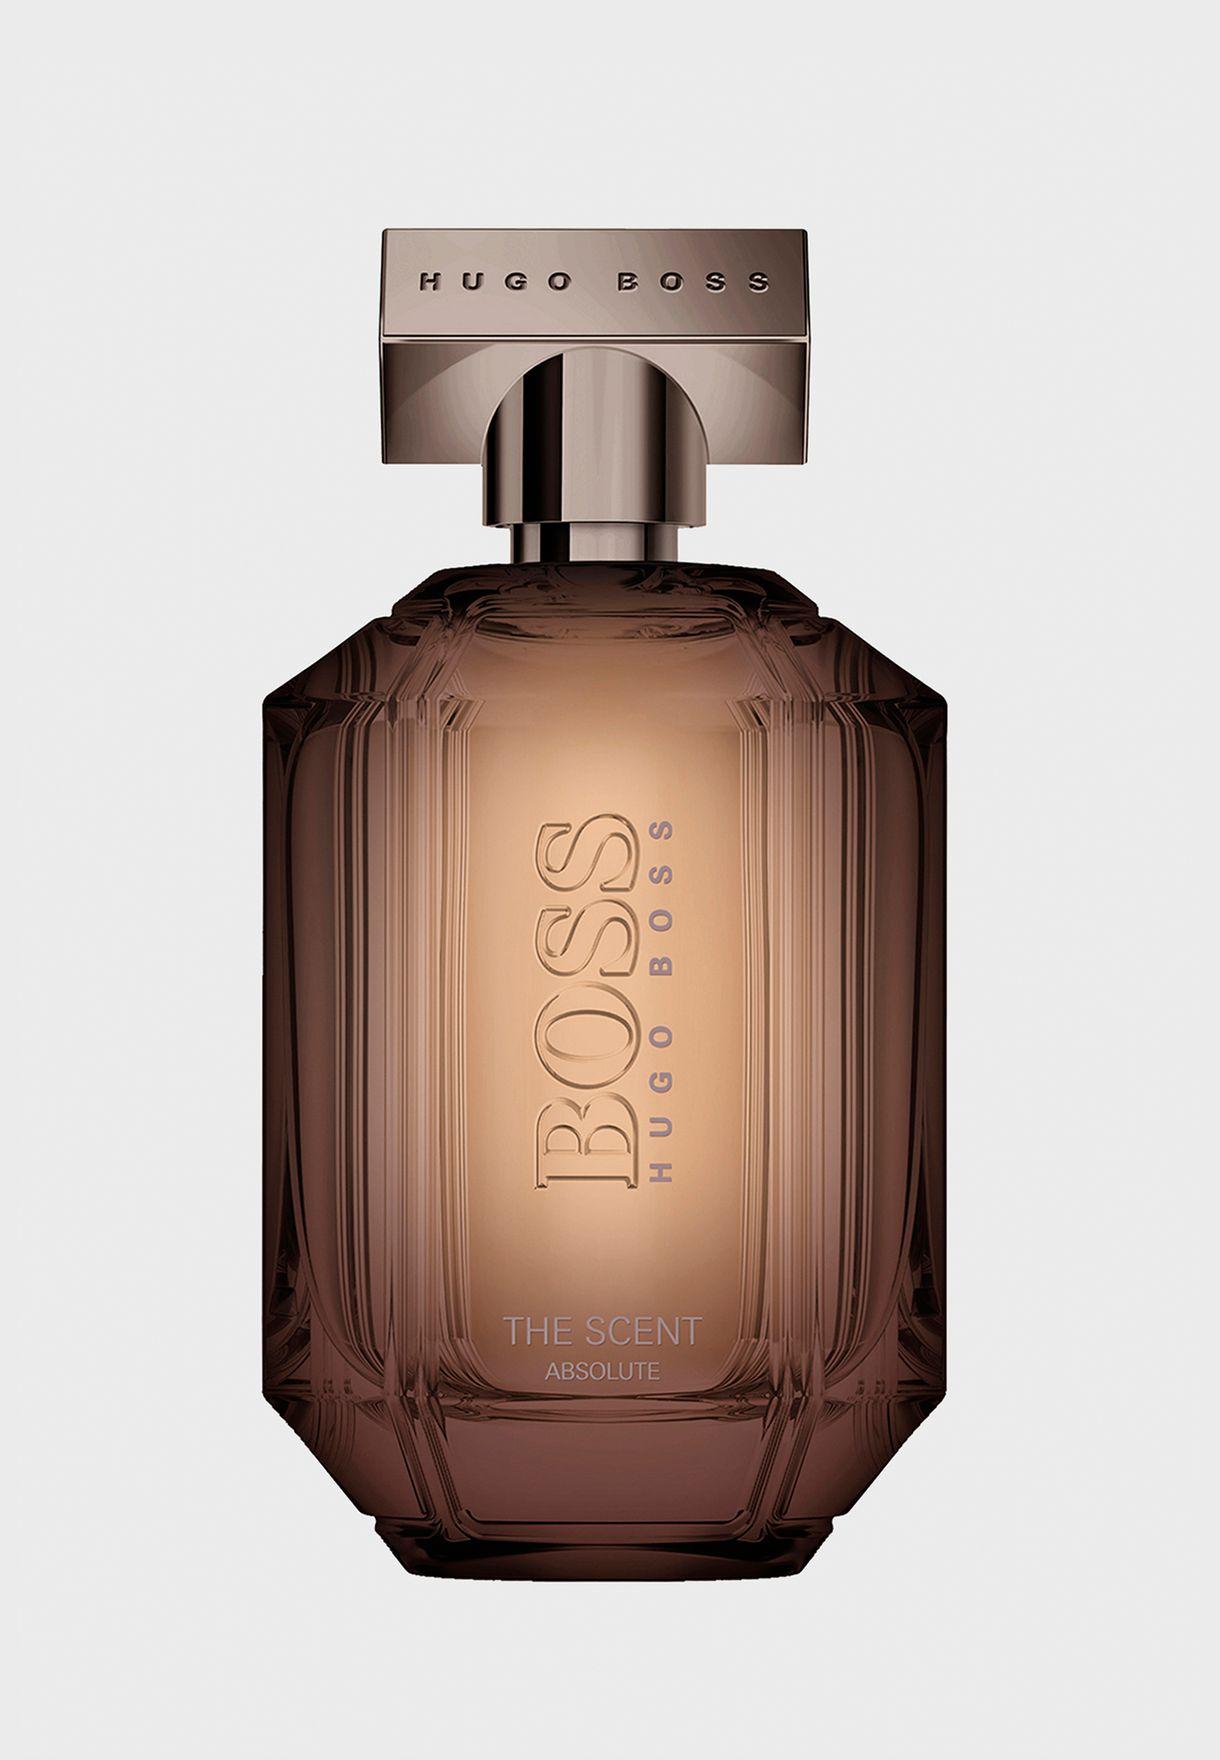 BOSS The Scent Absolute for Her Eau de Parfum 100ml